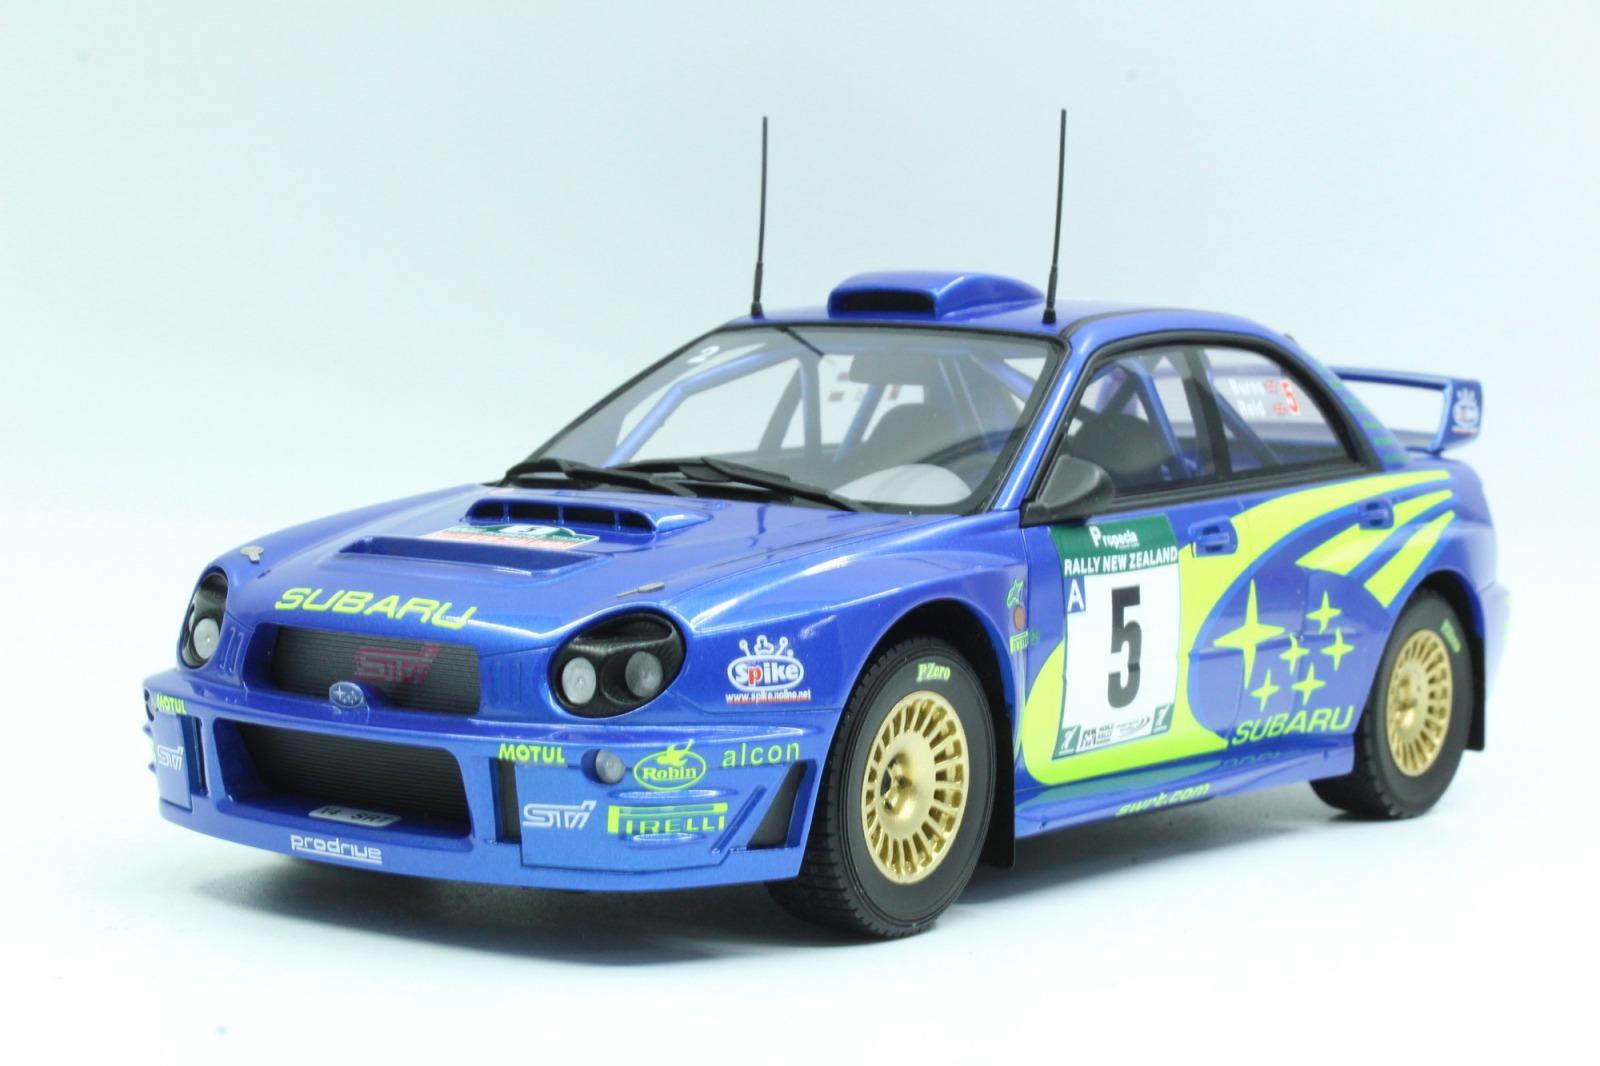 Topmarques 1:18 2001年ラリーニュージーランド 優勝モデル スバル インプレッサ WRC No.51:18 Top Marques Subaru Impreza S7 555 WRT New Zealand winner 2001 R.BURNS - R.REID 1/18 by Topmarques NEW